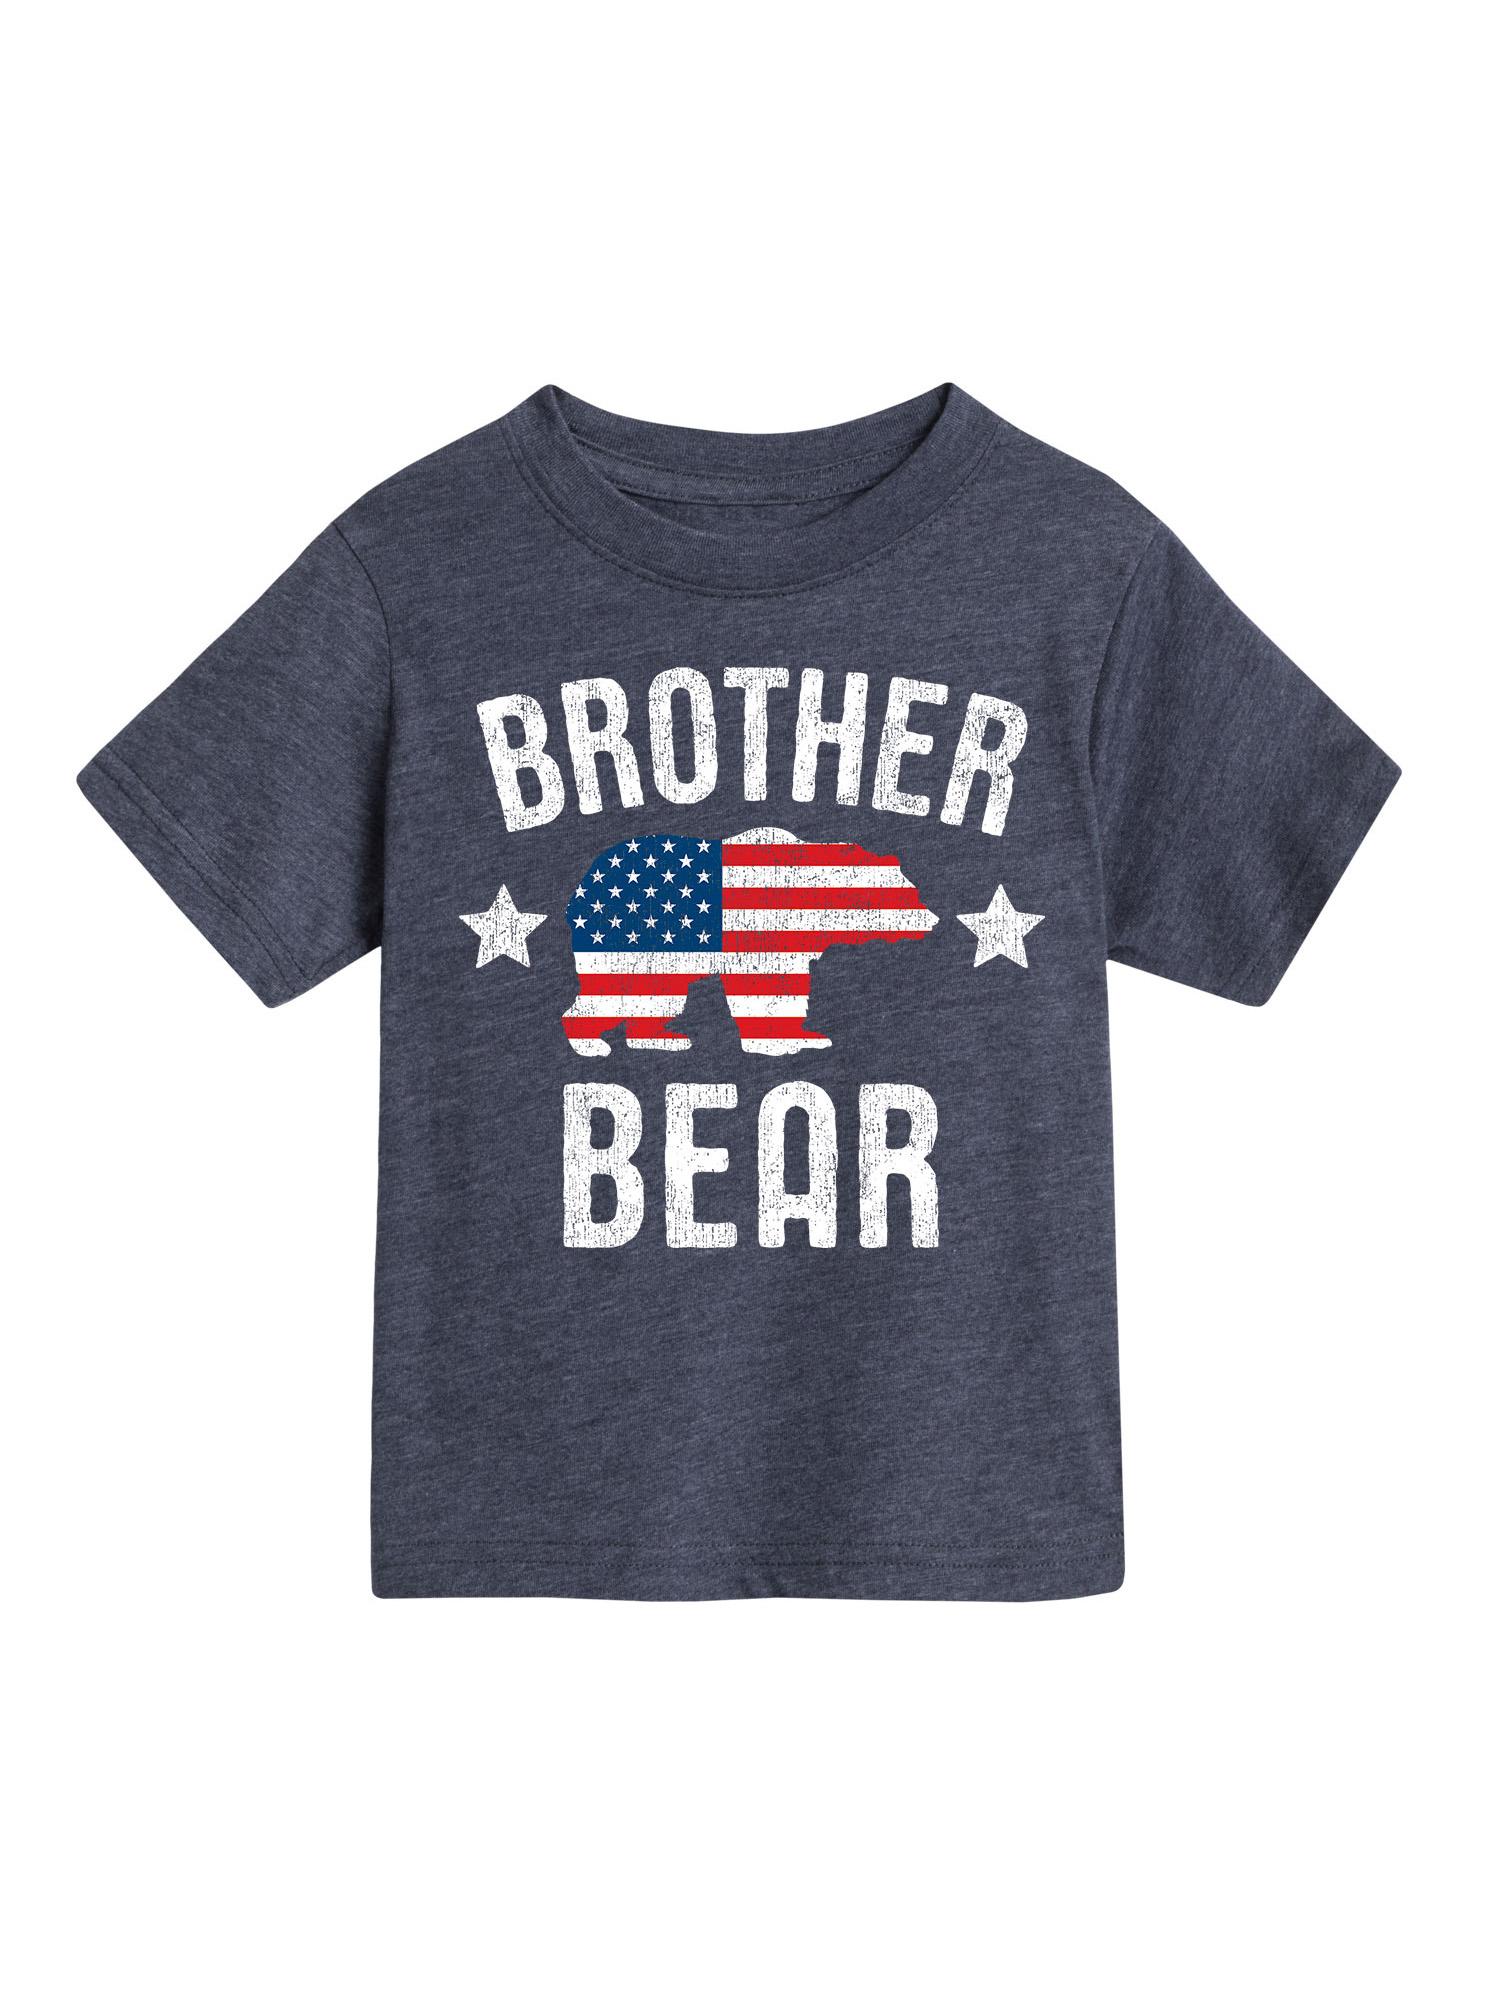 Brother Bear Patriotic  - Toddler Short Sleeve Tee